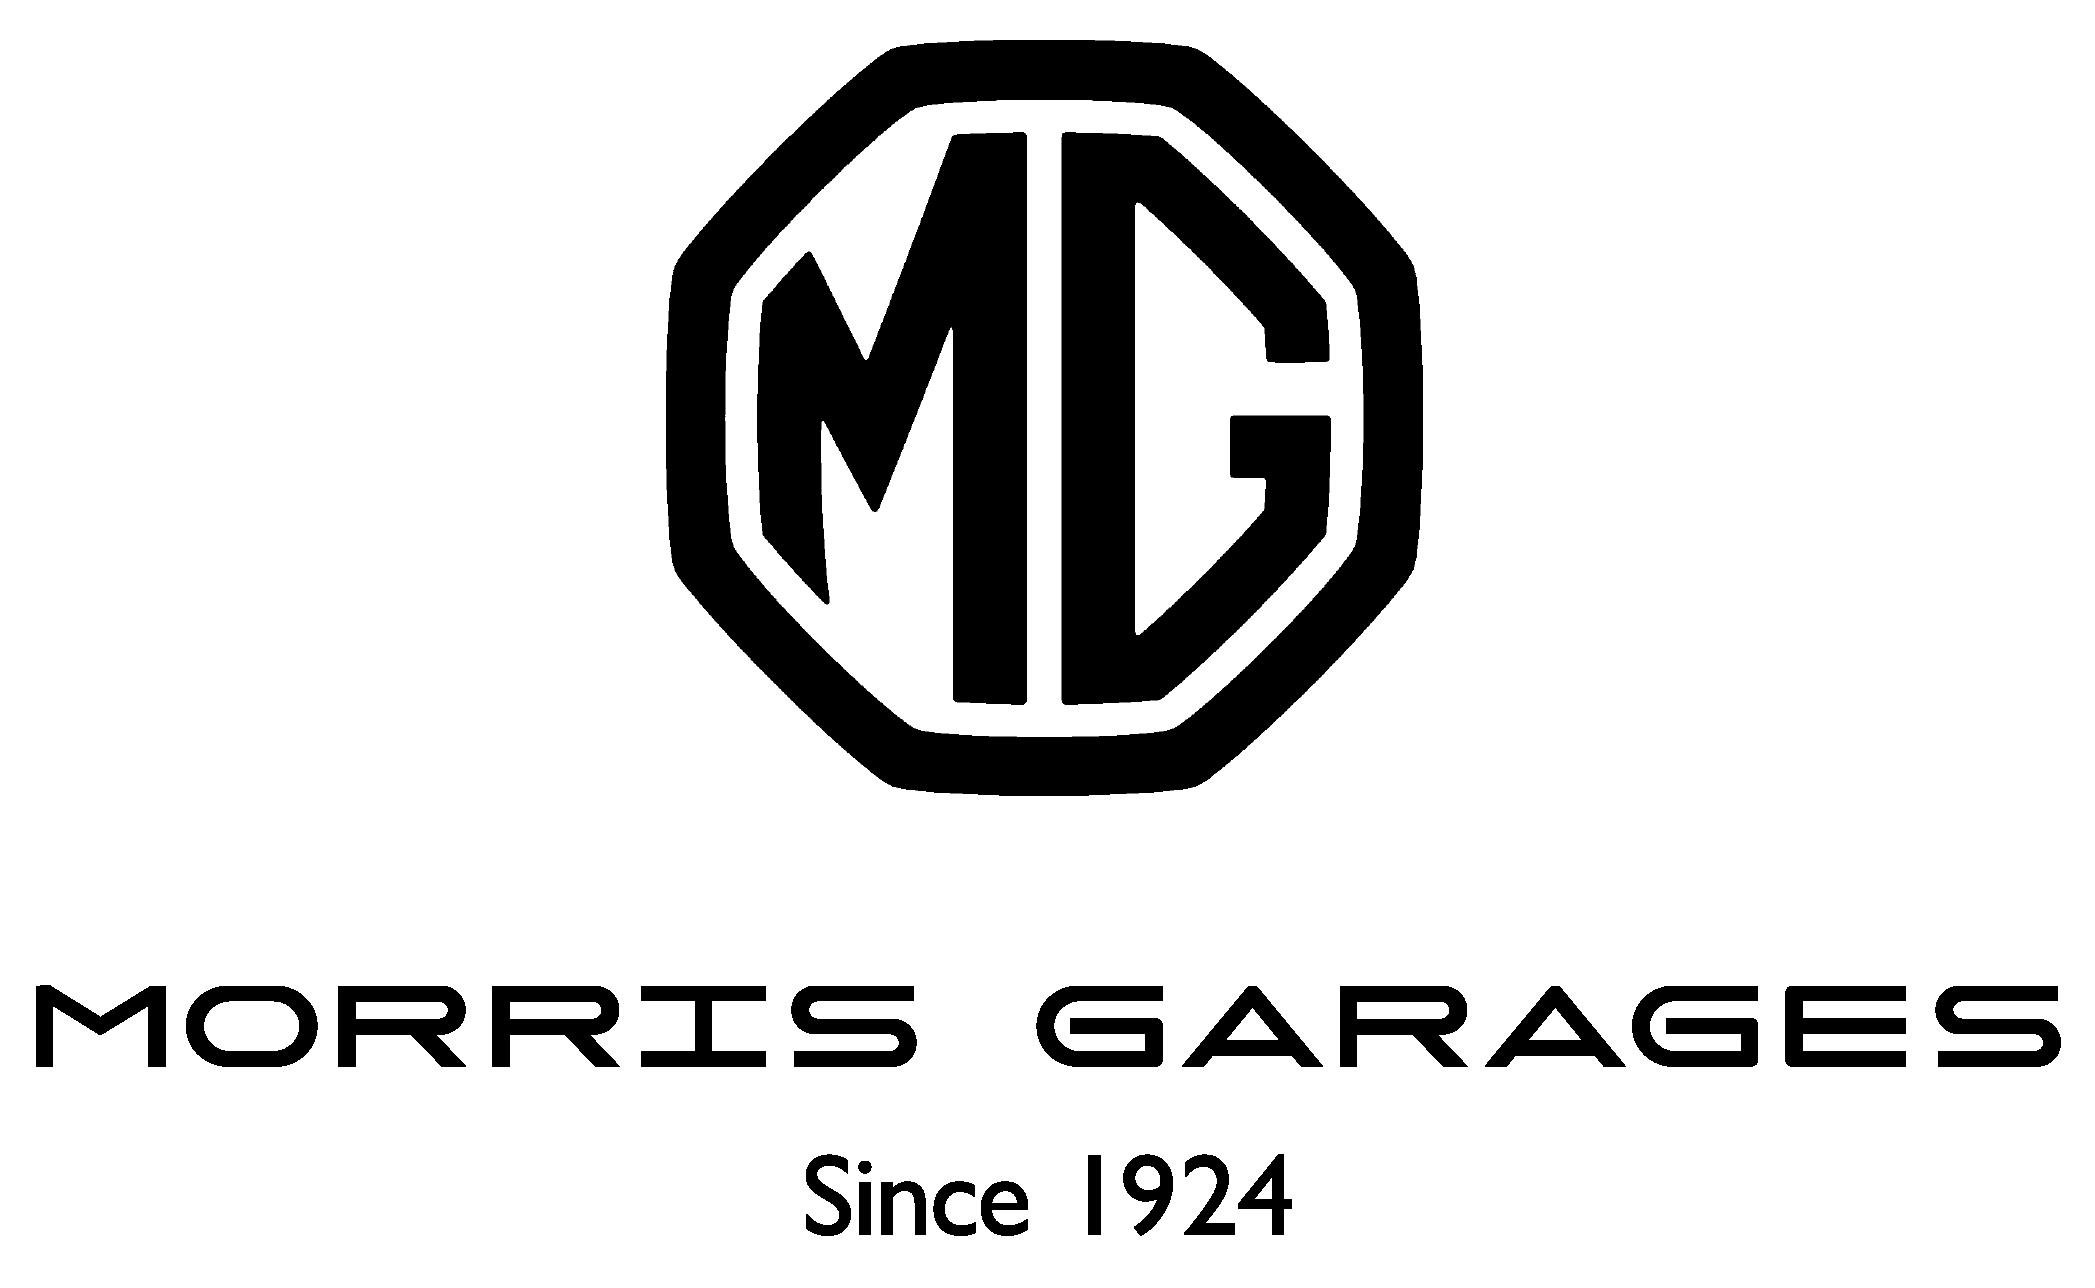 https://assets.roar.media/assets/126Hr6SvPx95Gw2E_MG_Logo-02.png